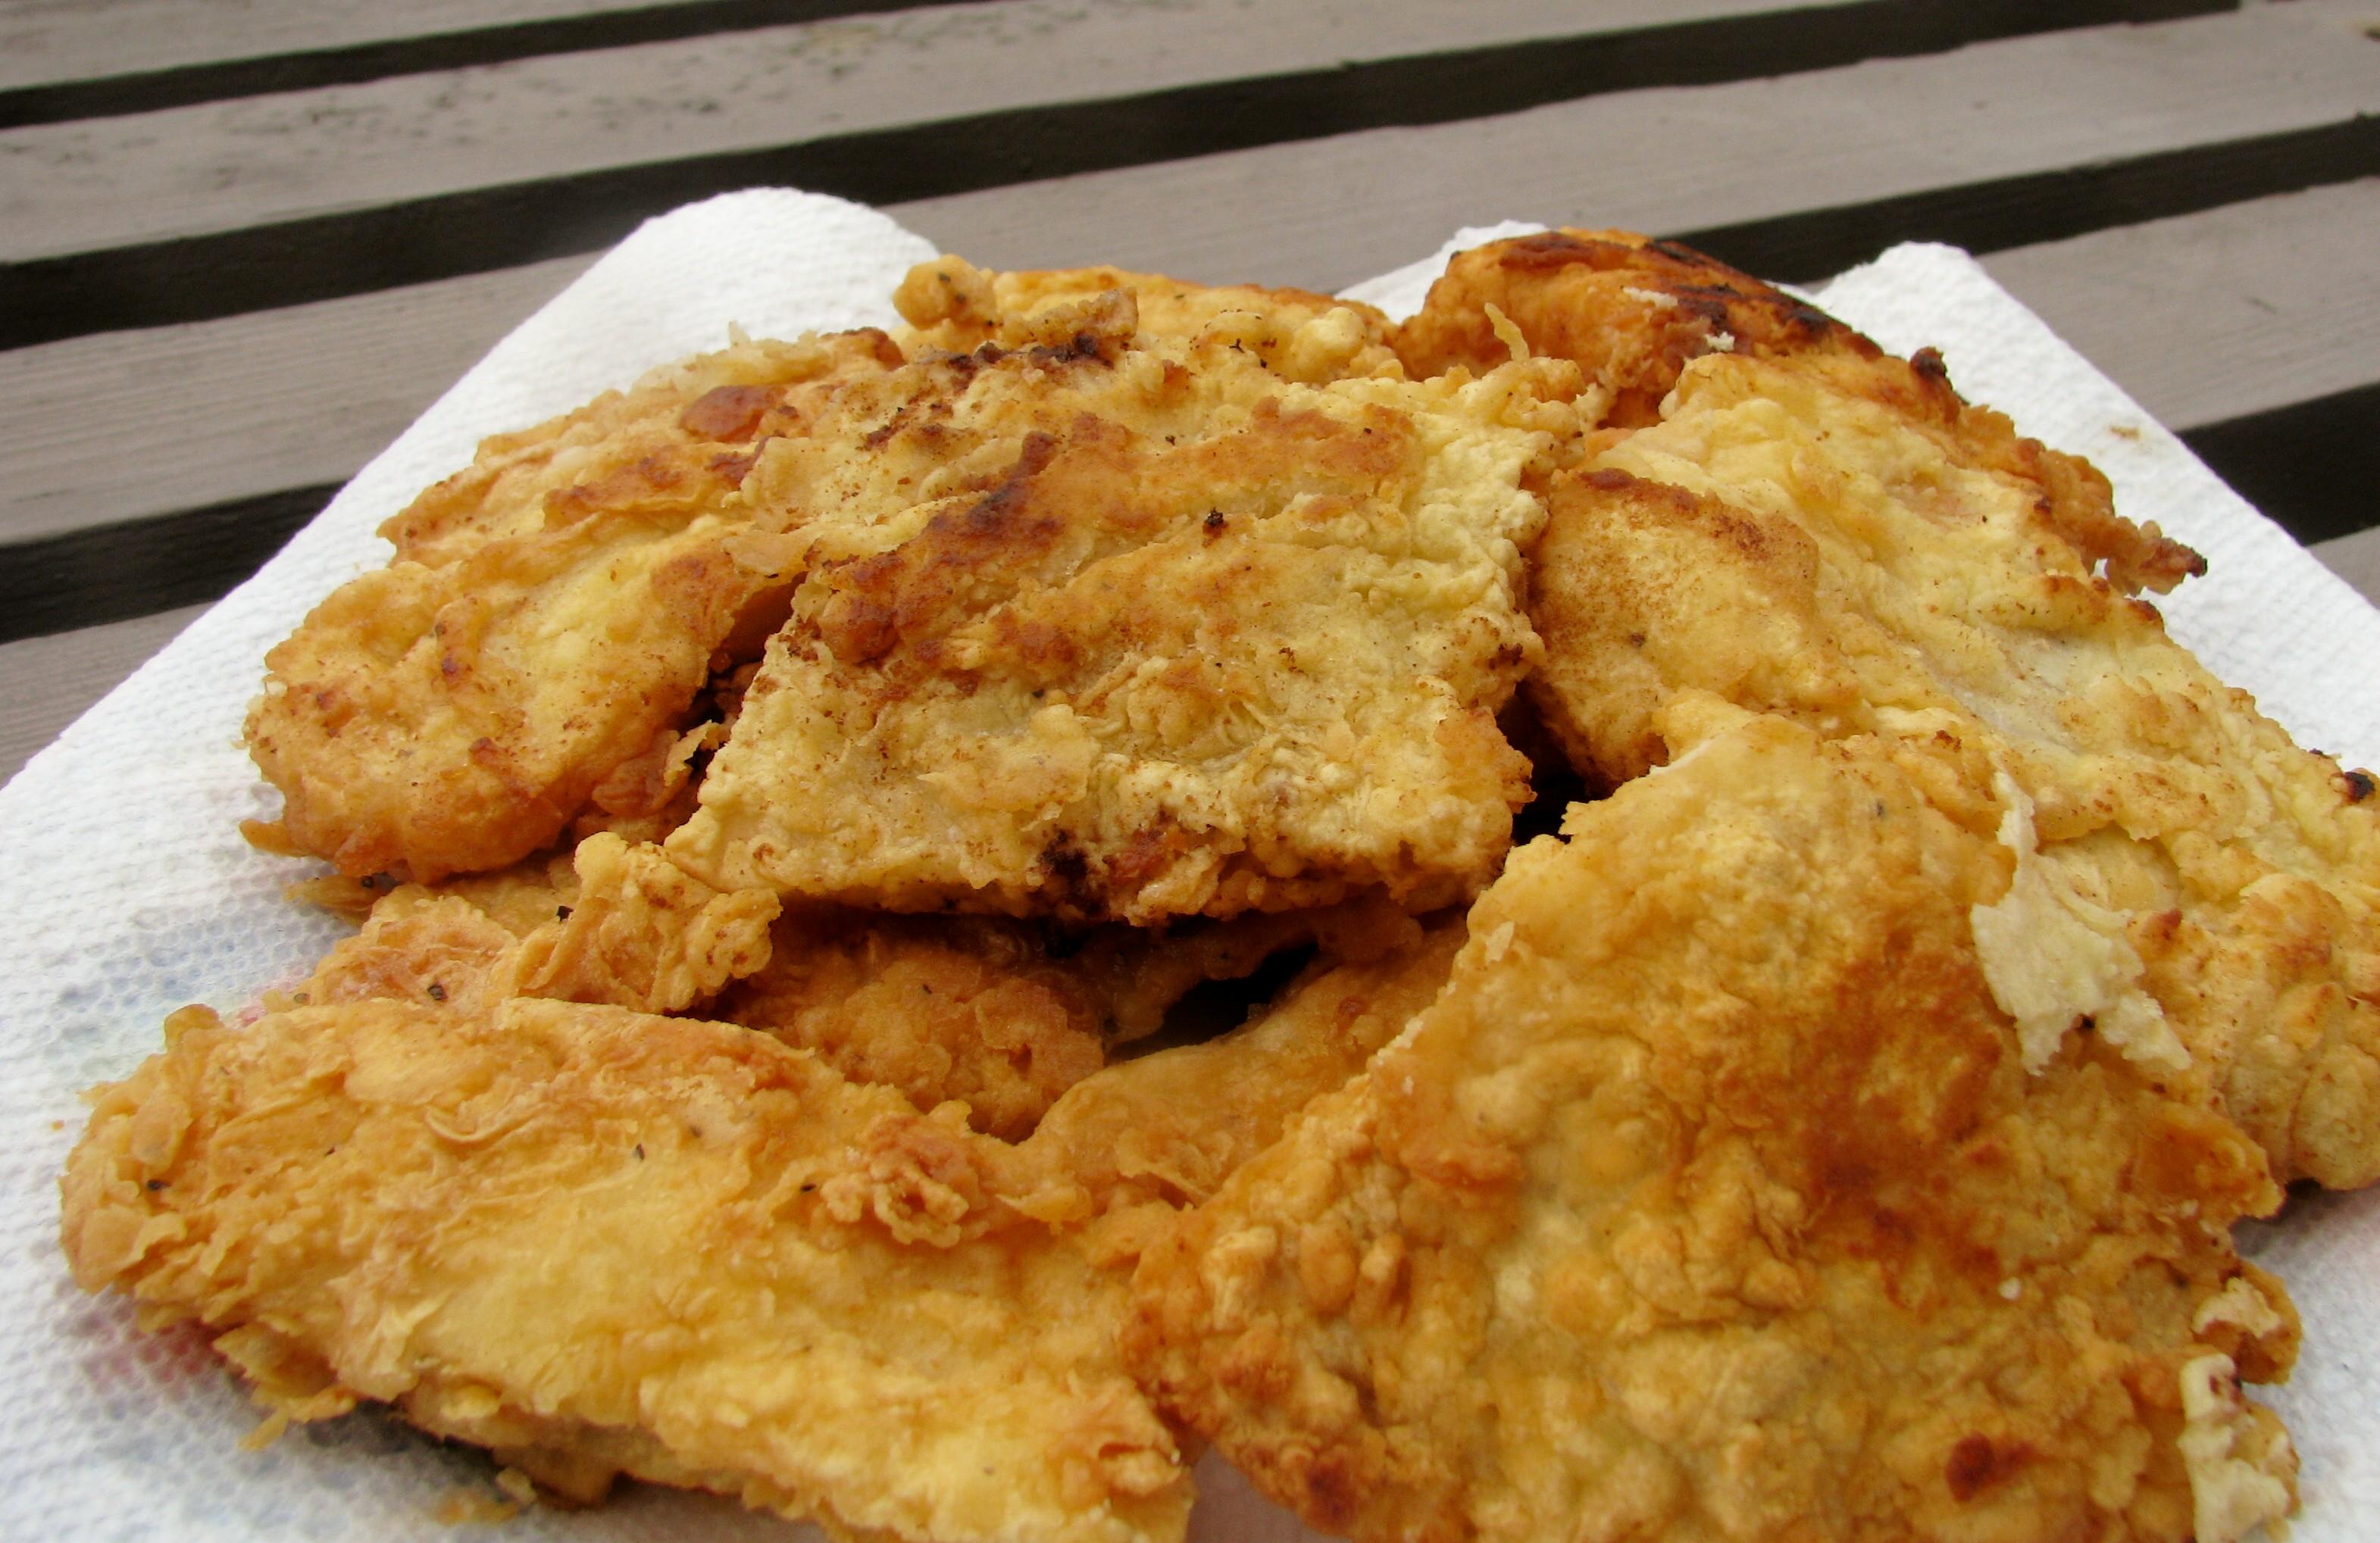 Easy deep fried recipes